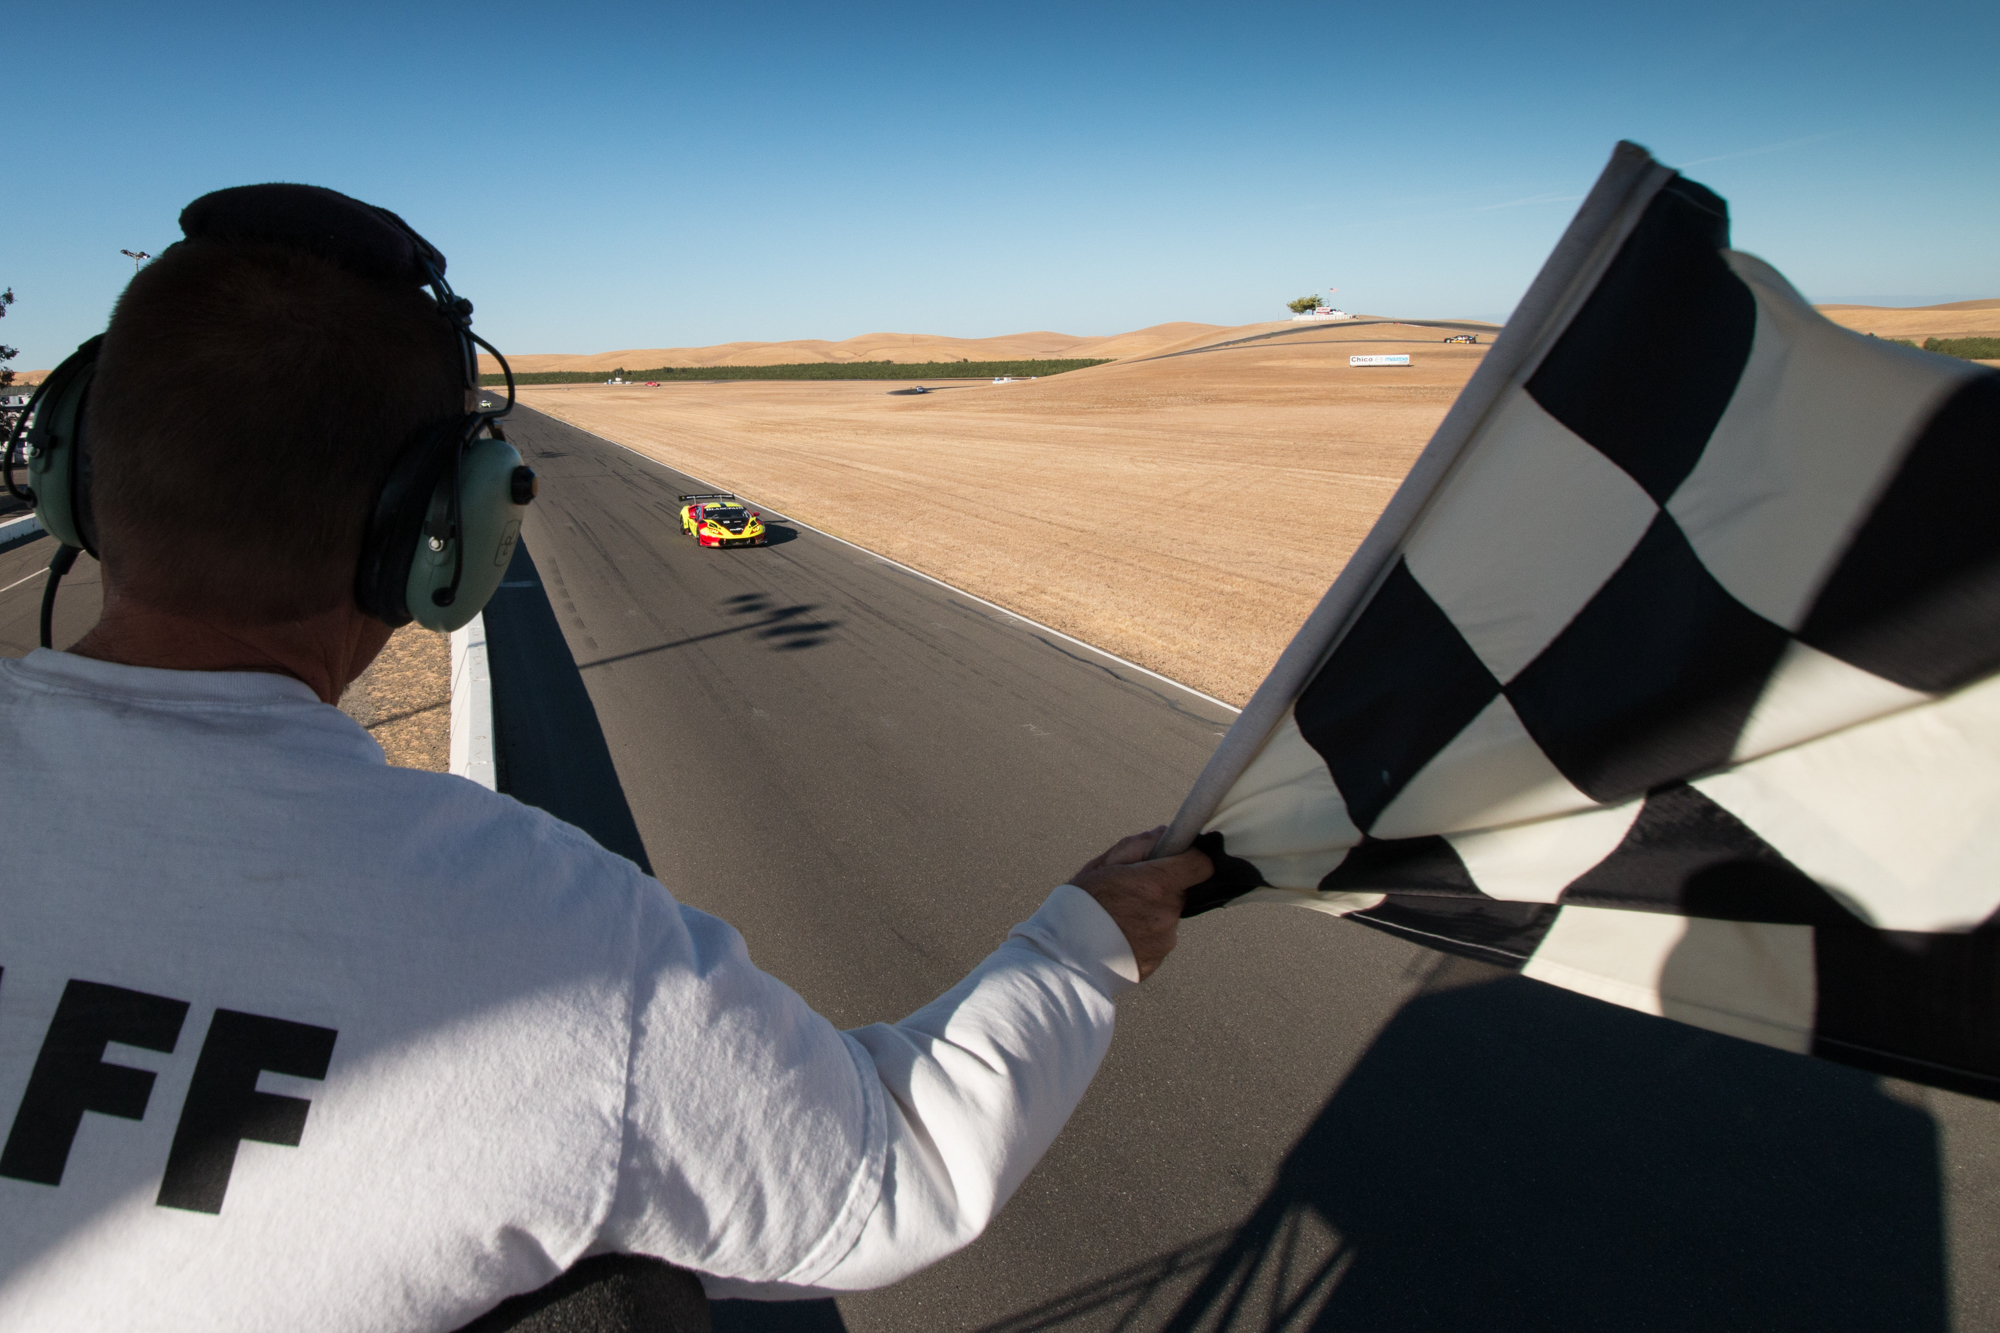 Steven-Racing-20130208-45802.jpg